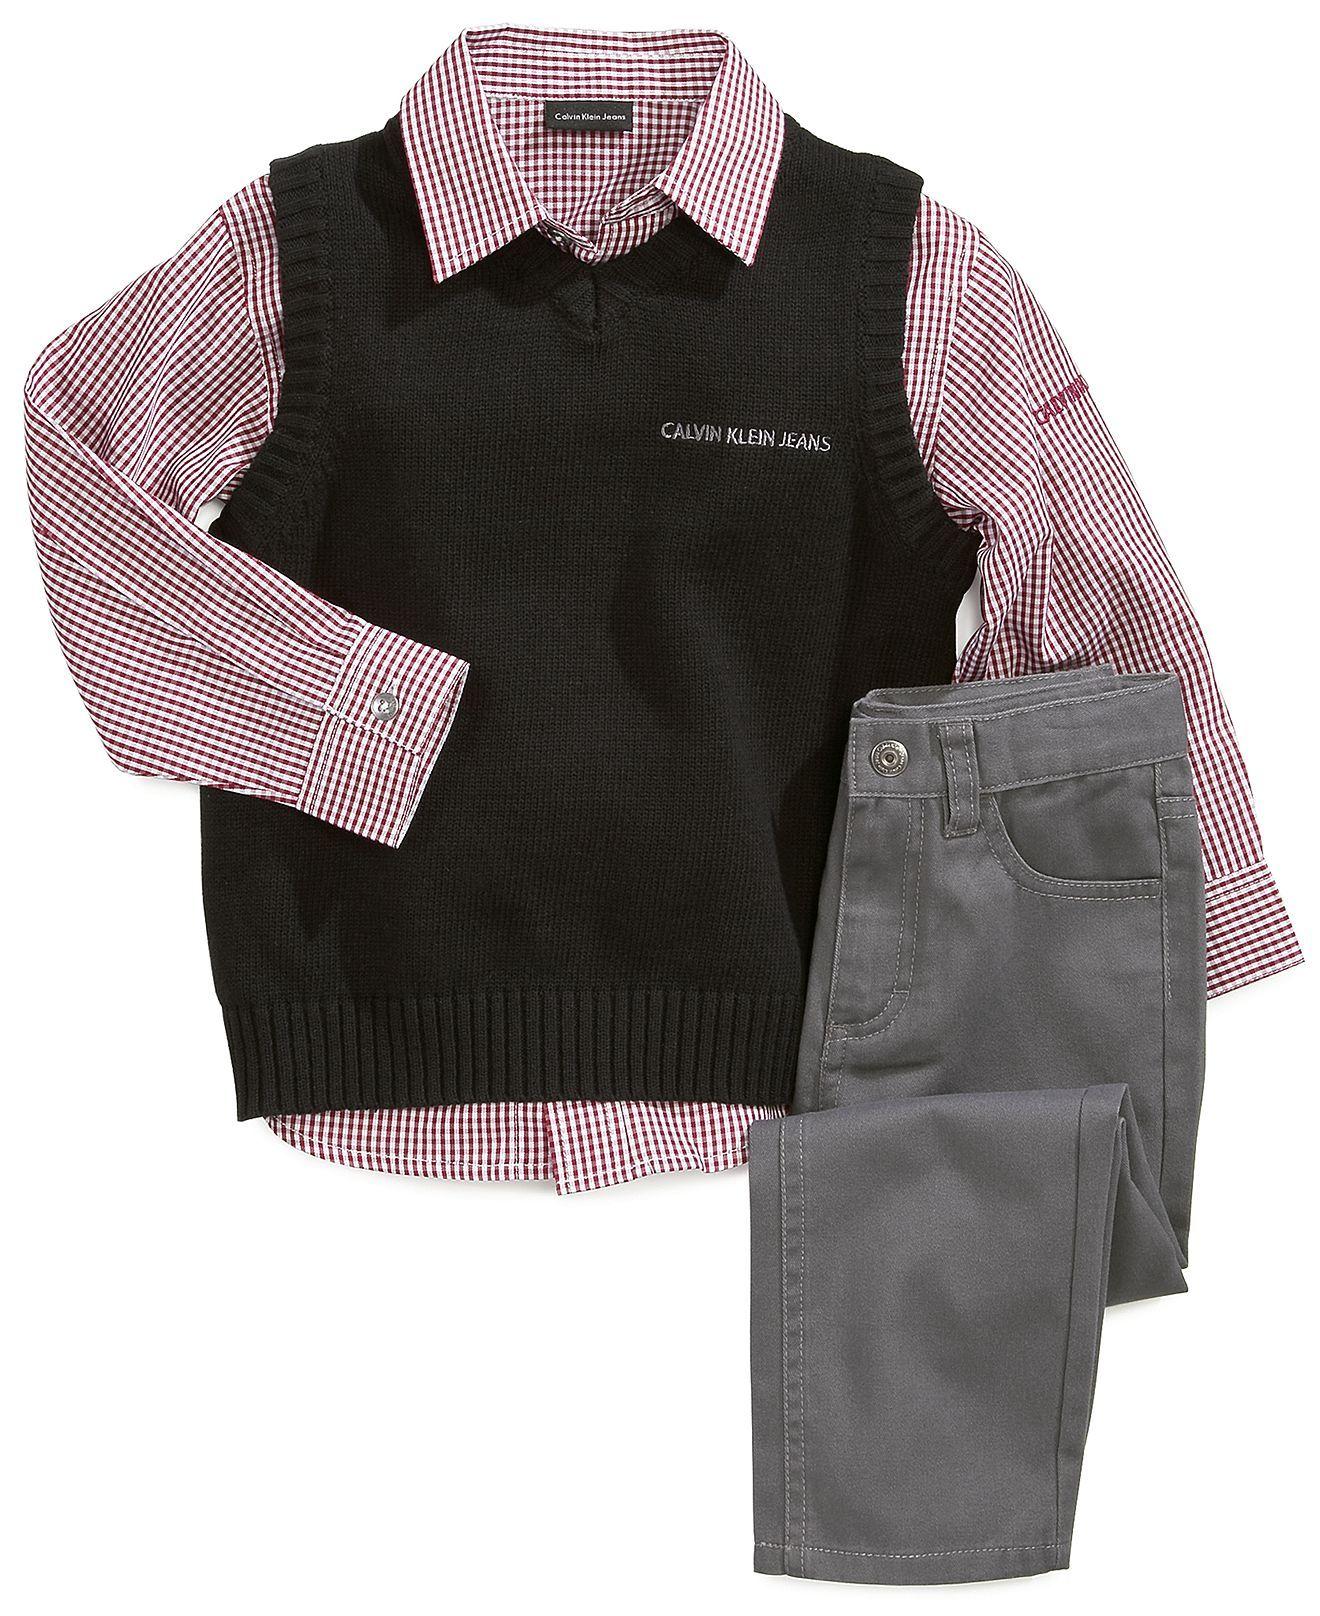 30a3527d875f Calvin Klein Baby Boys  3-Piece Vest